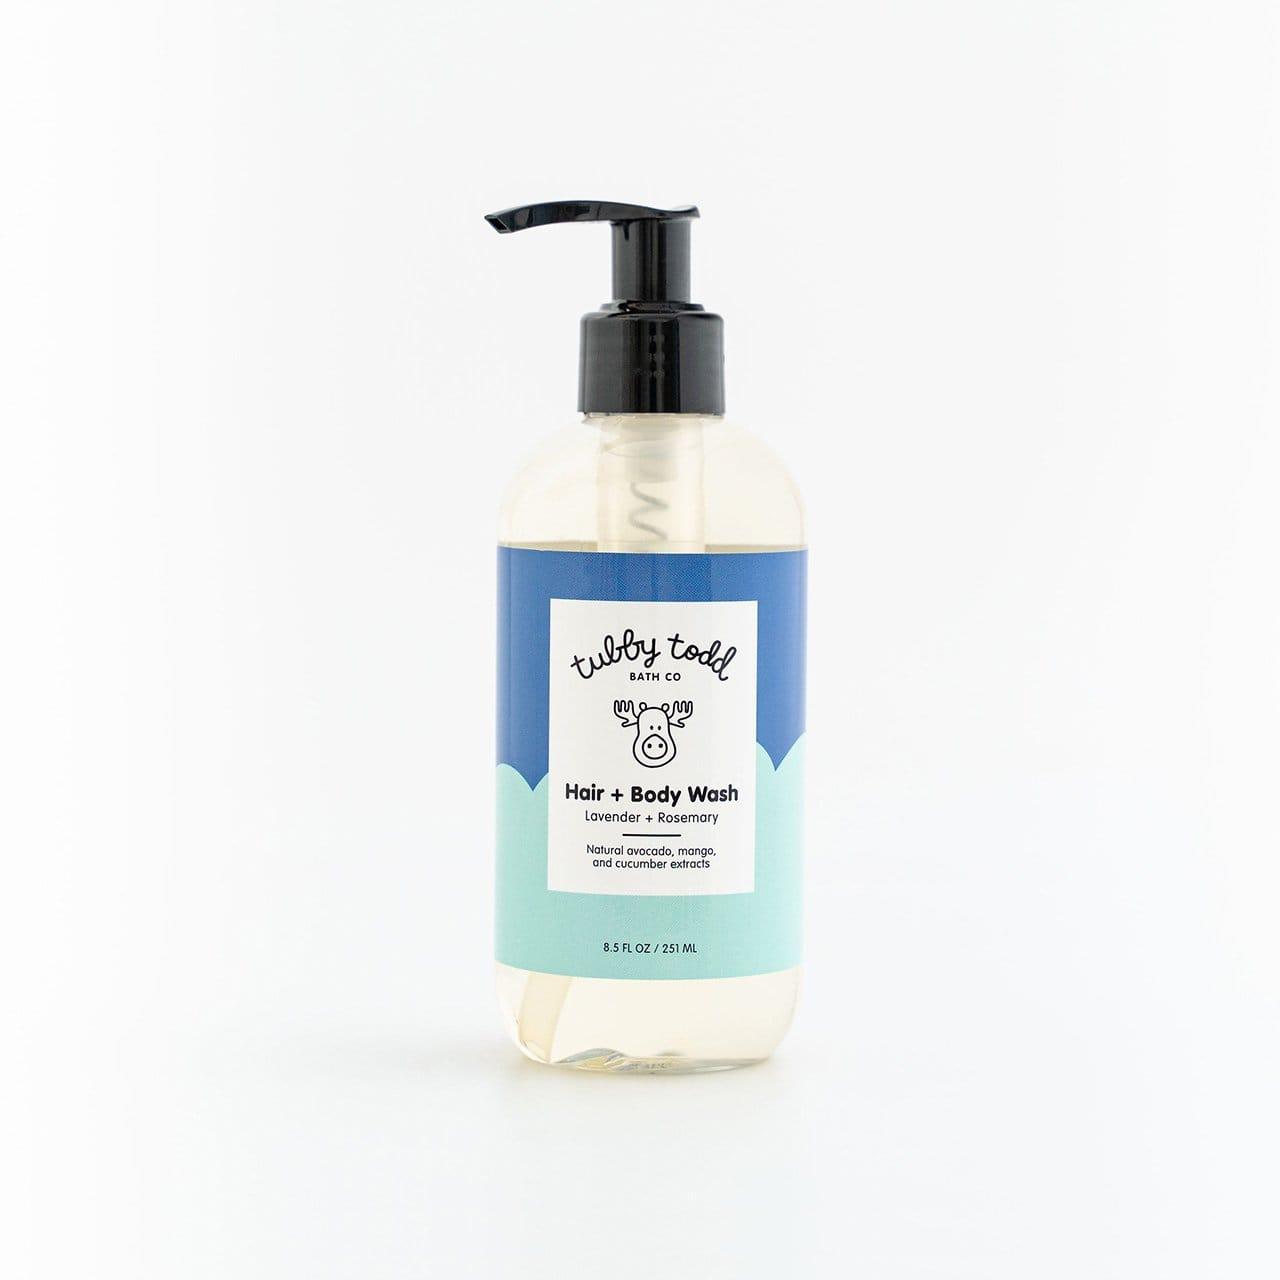 Lavender Rosemary Hair Body Wash 8.5 oz product image